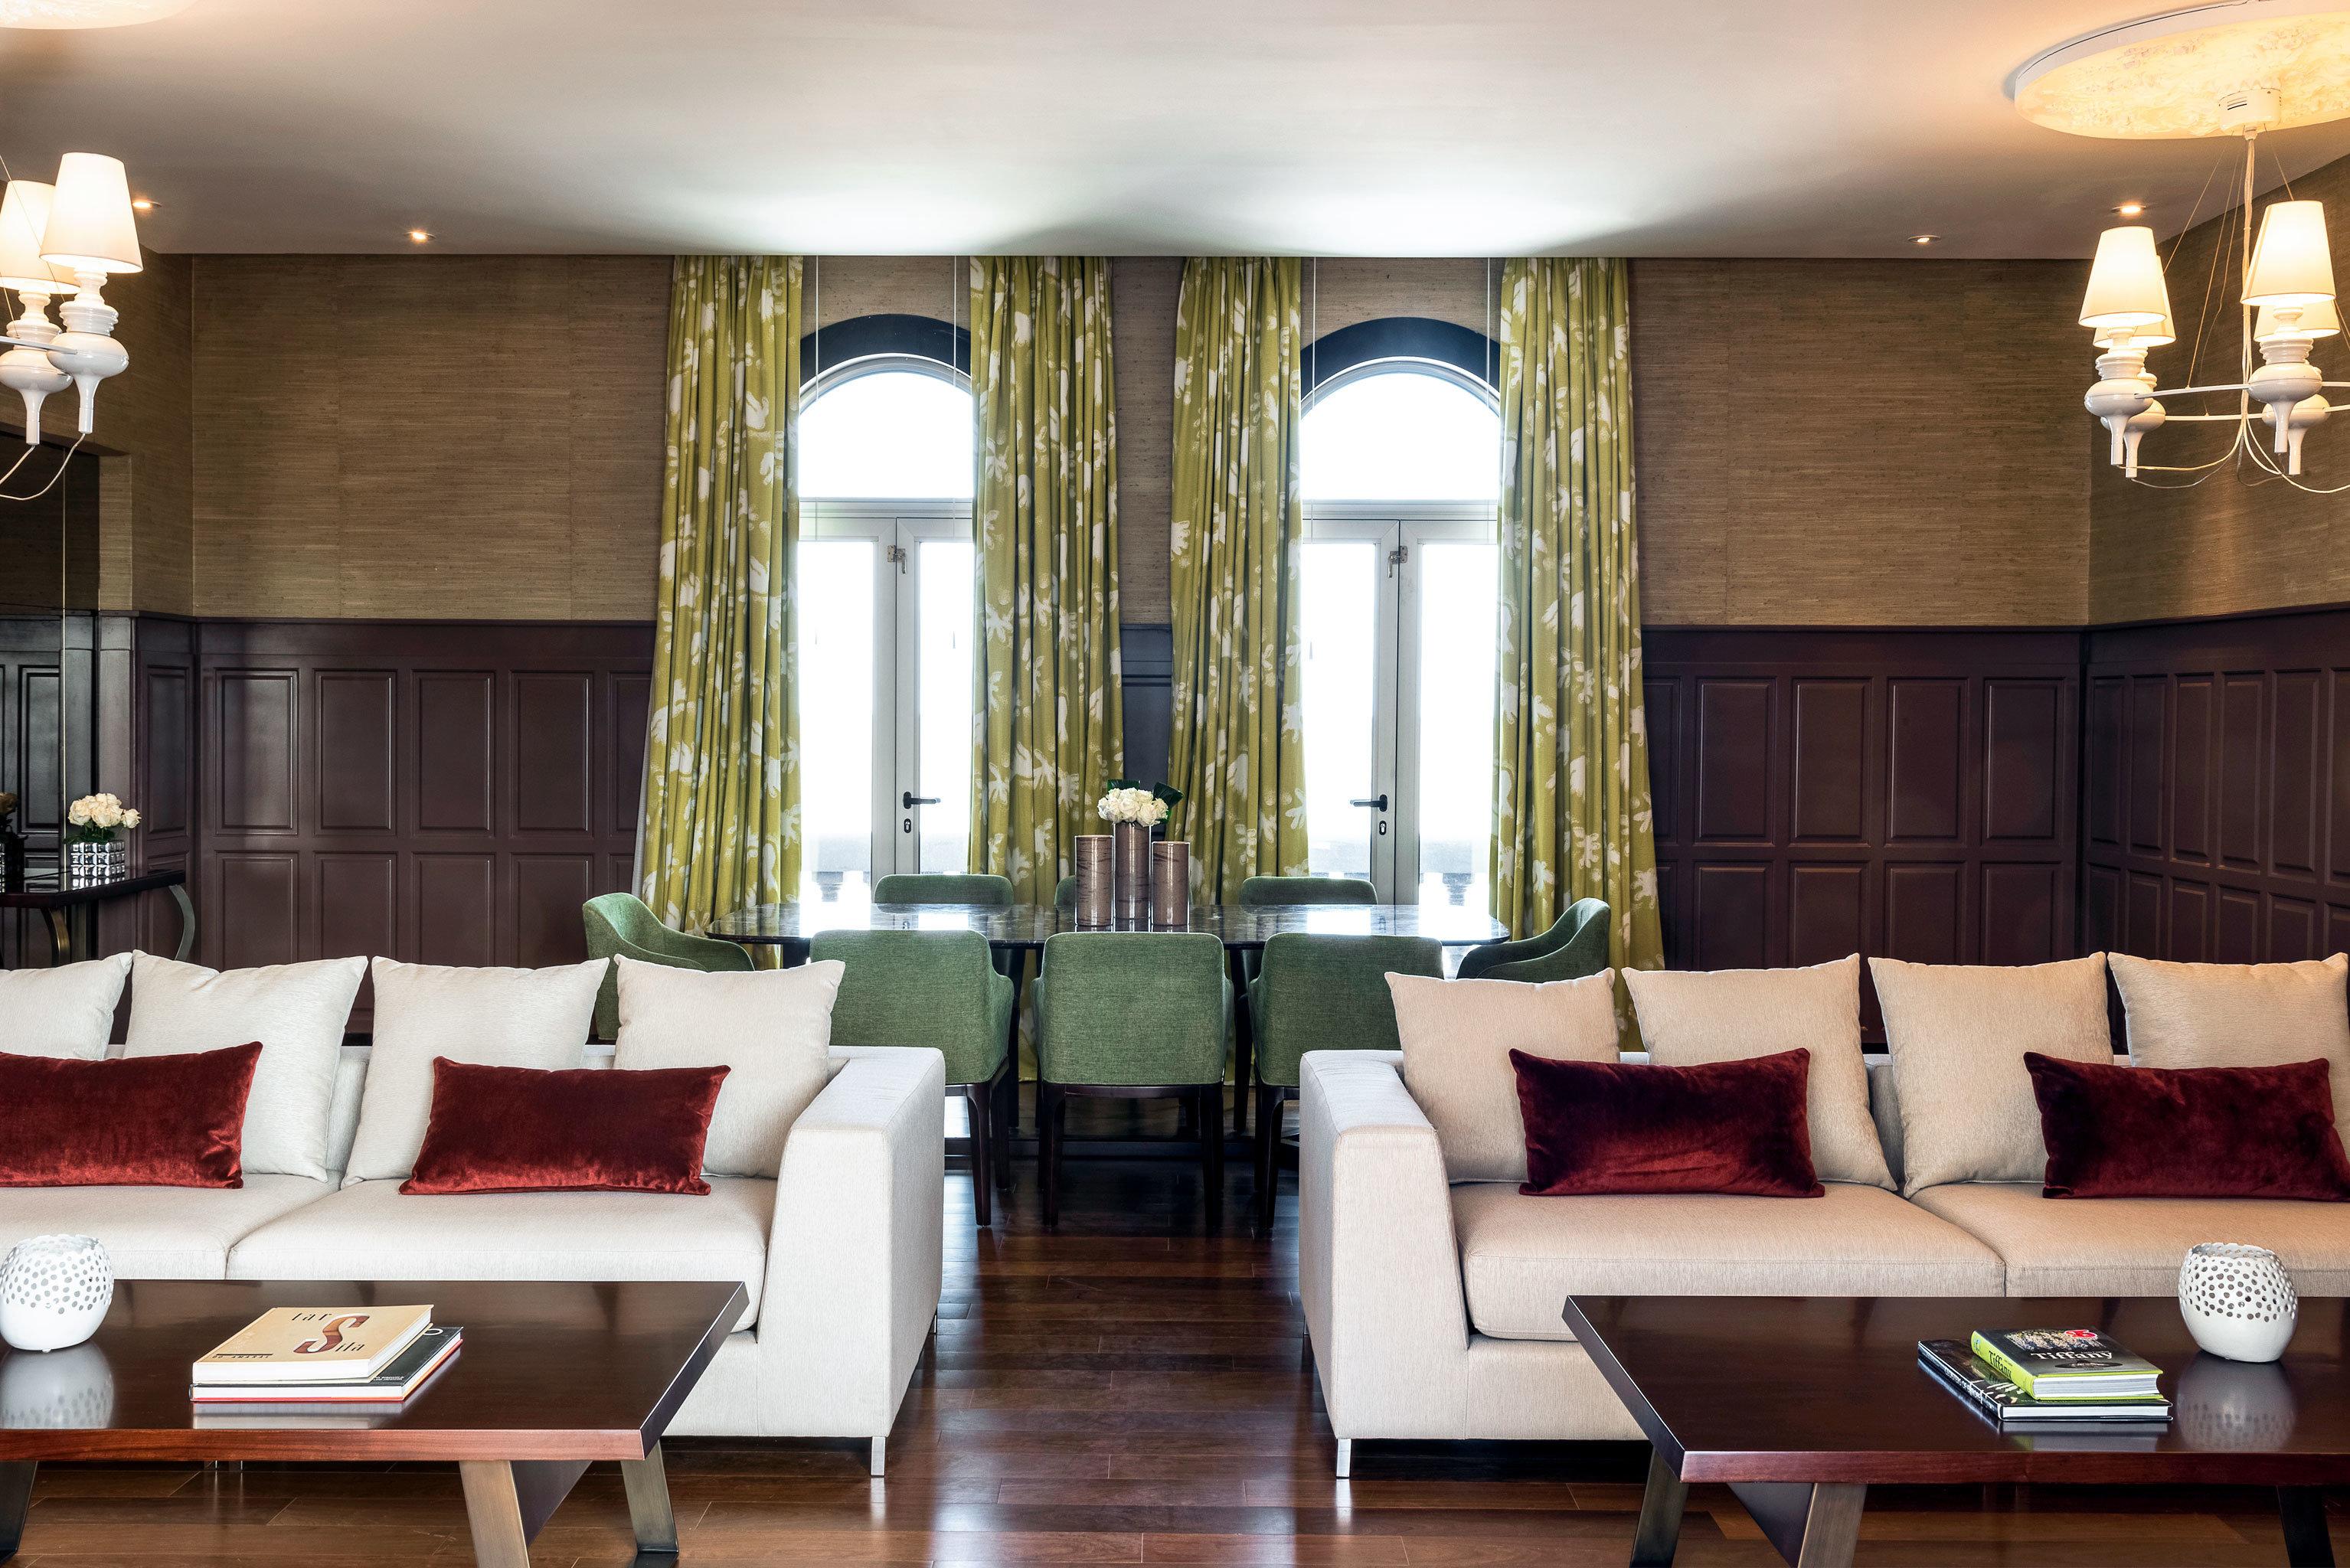 Lounge Luxury Resort sofa property living room Suite home Lobby restaurant condominium seat leather